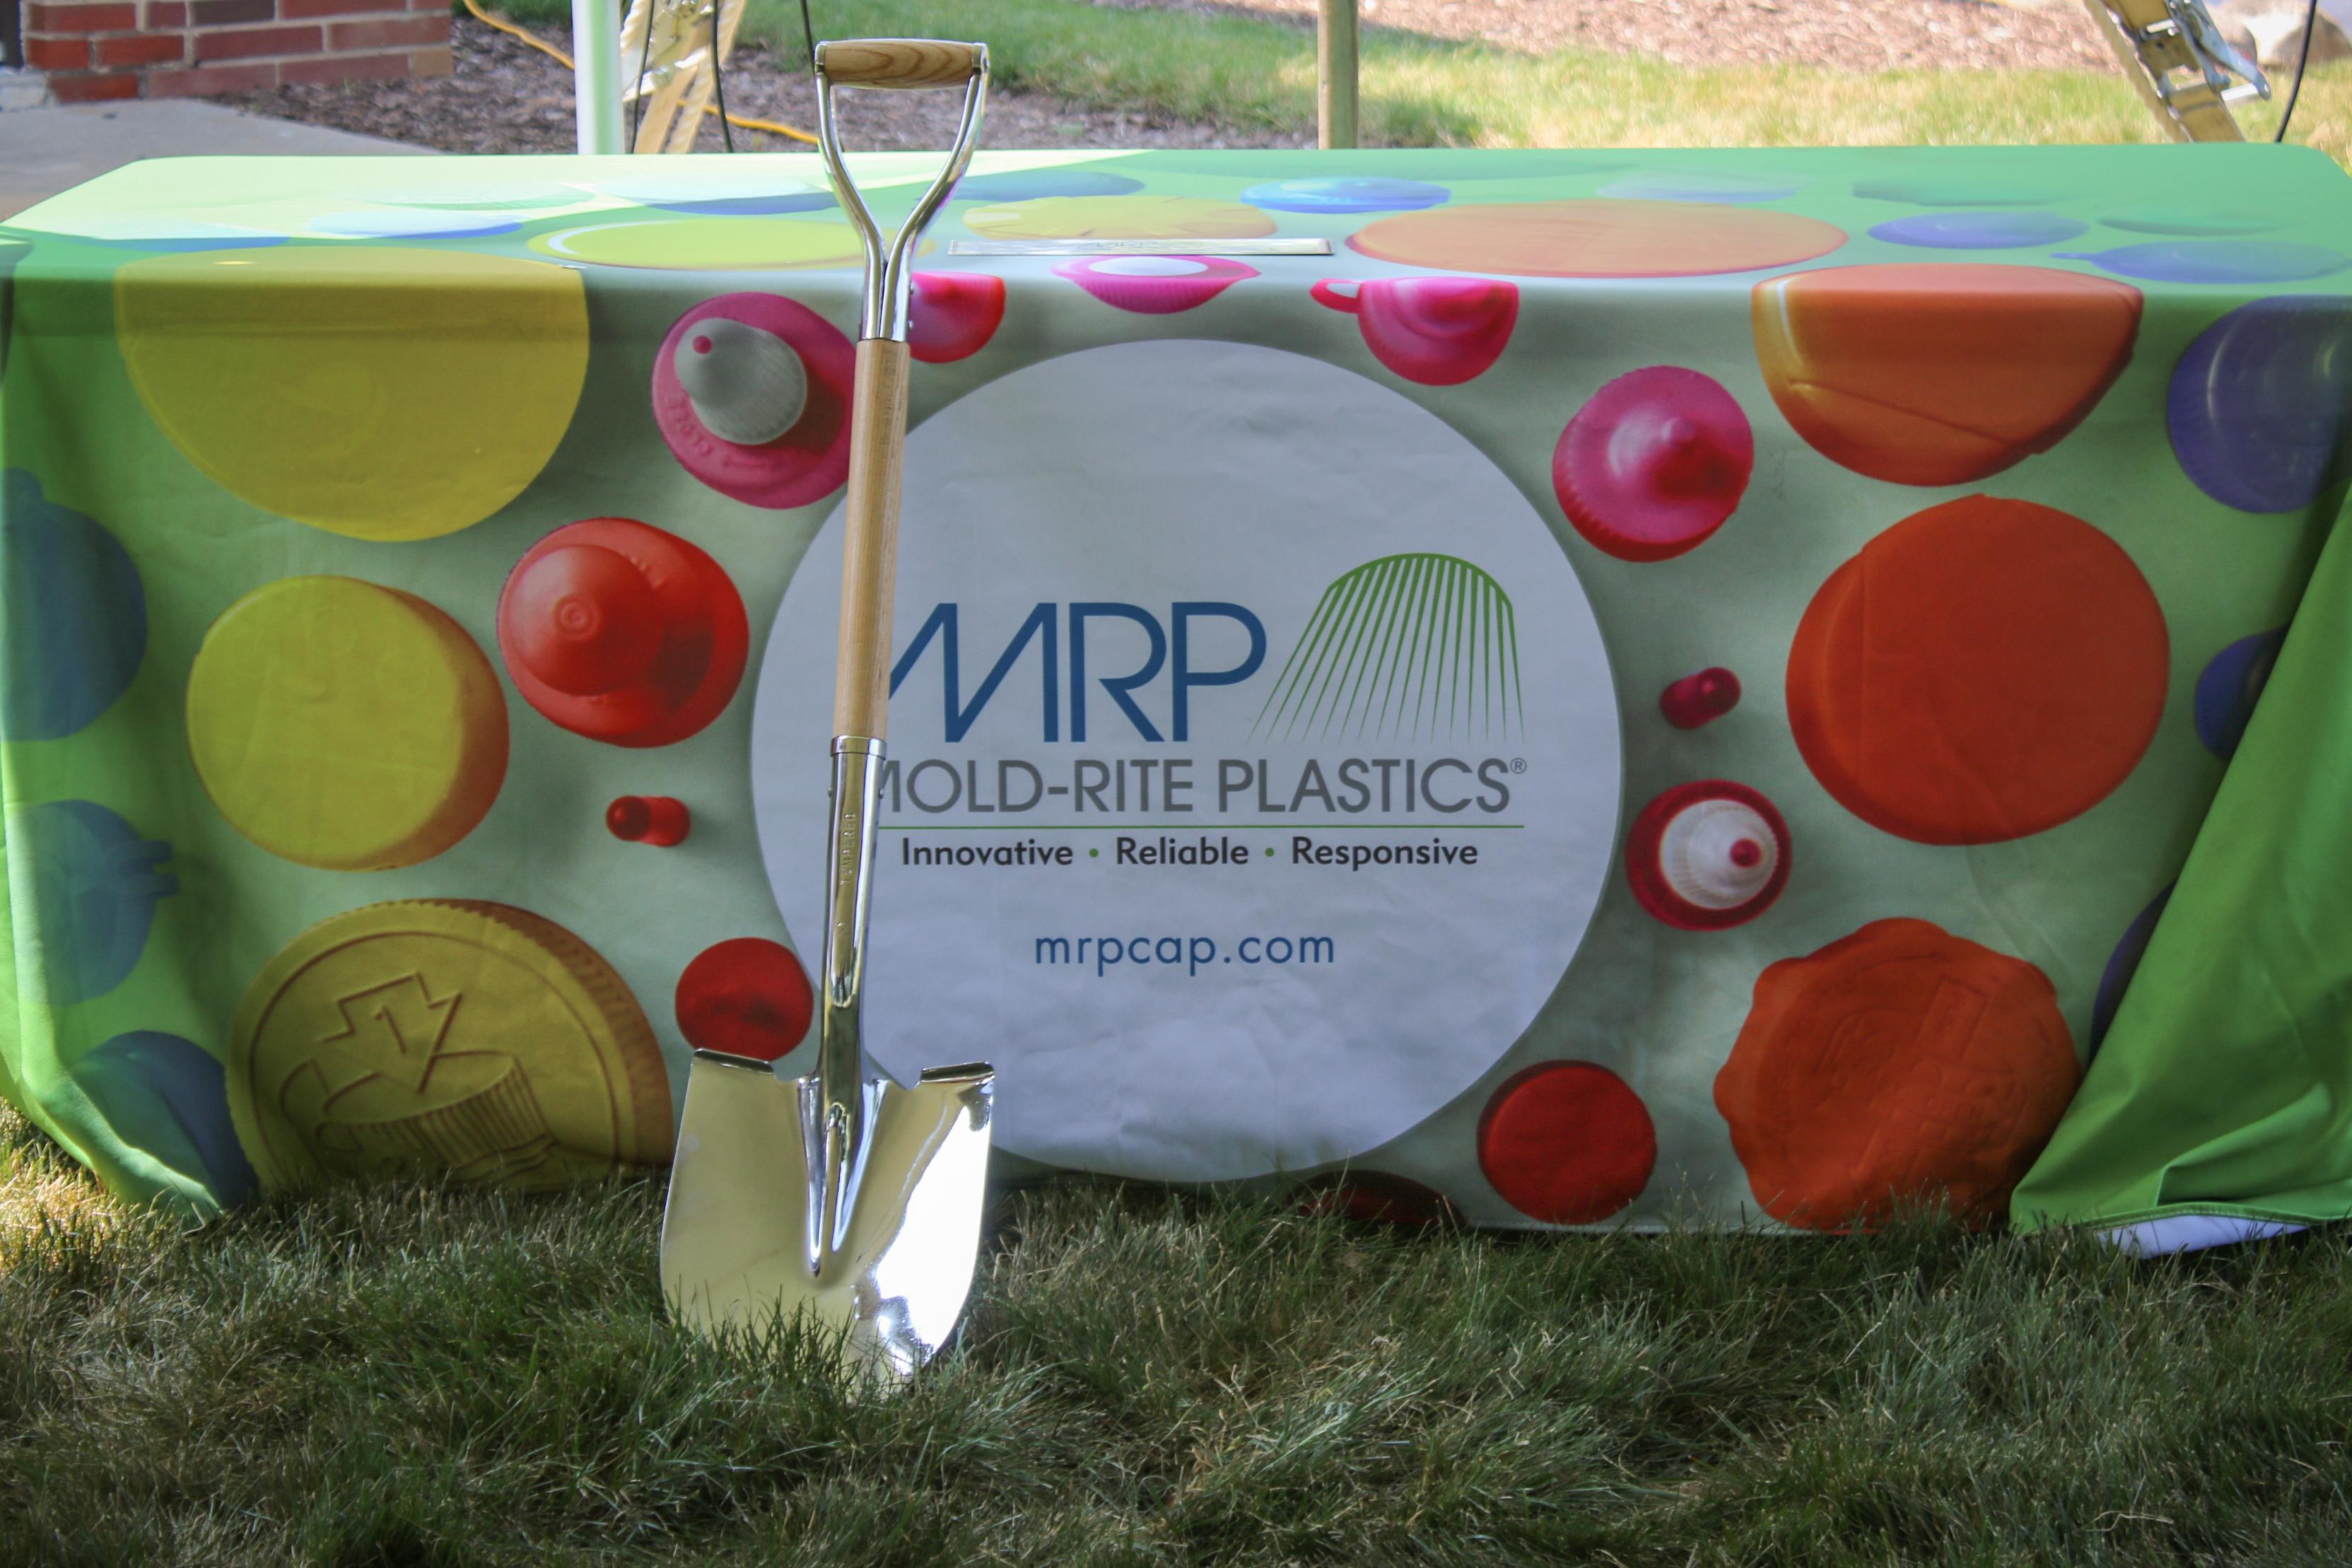 Mold-Rite Plastics Breaks Ground on Building Expansion